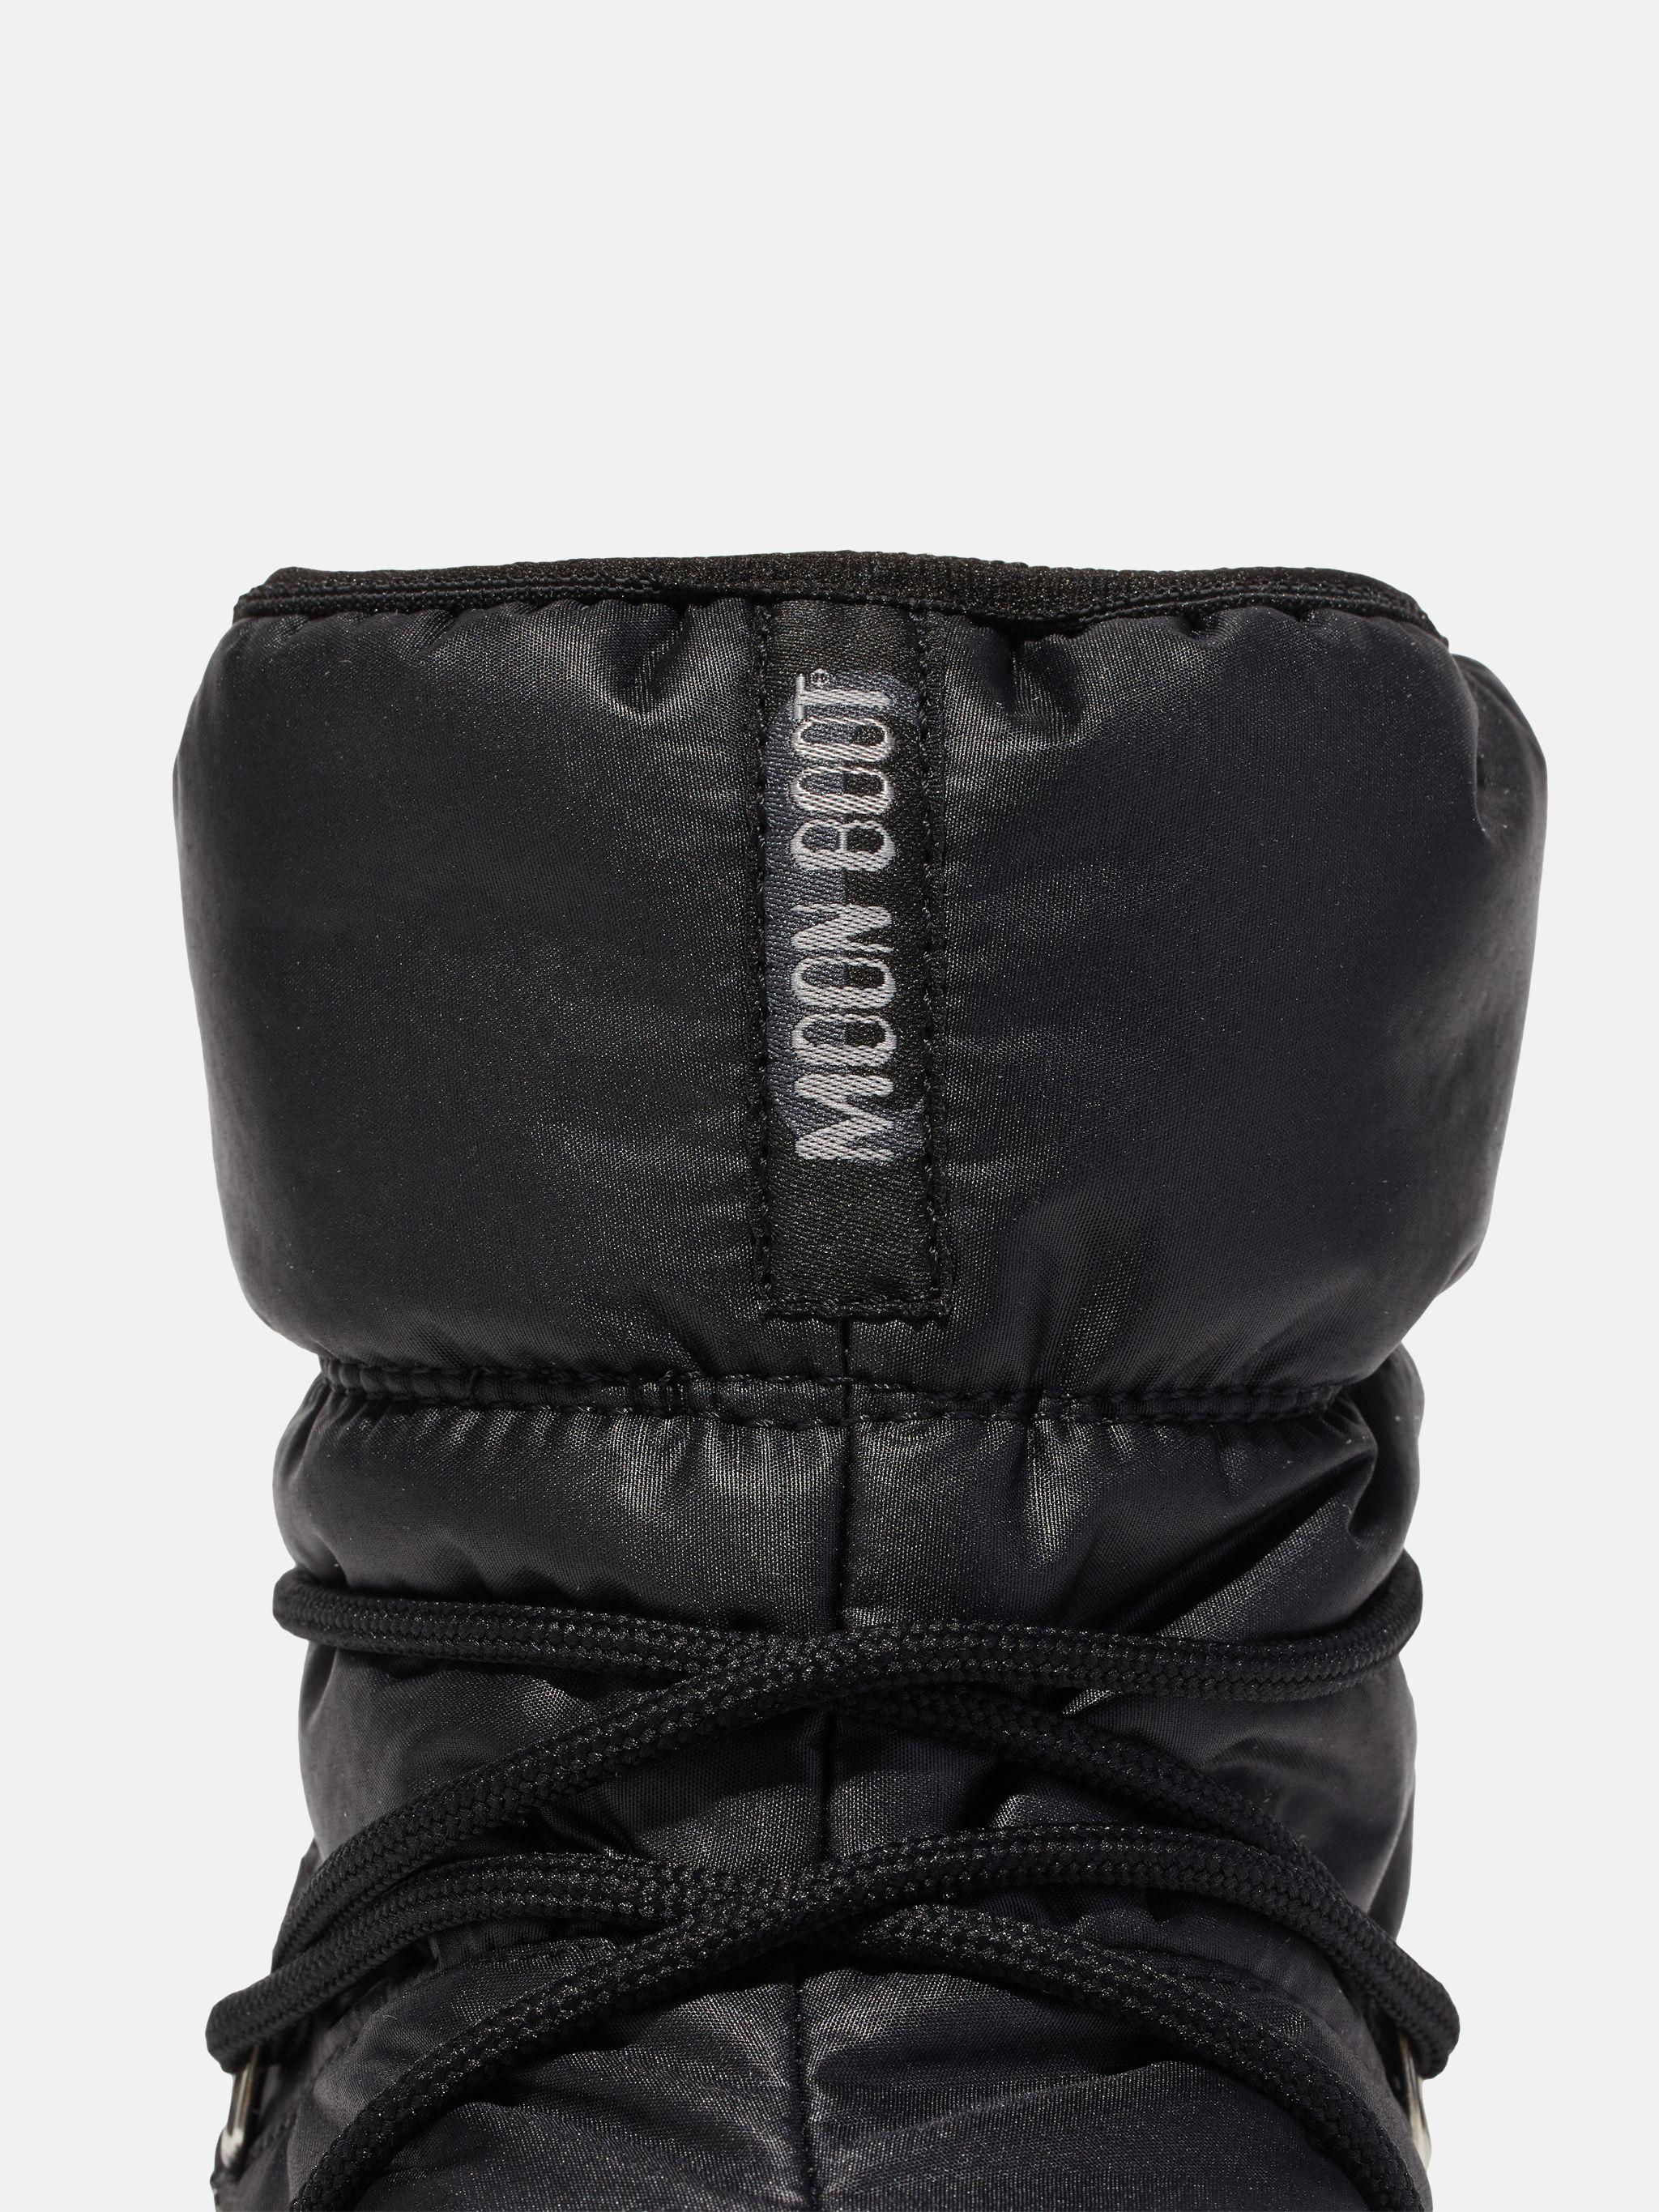 PROTECHT LOW BLACK BOOTS